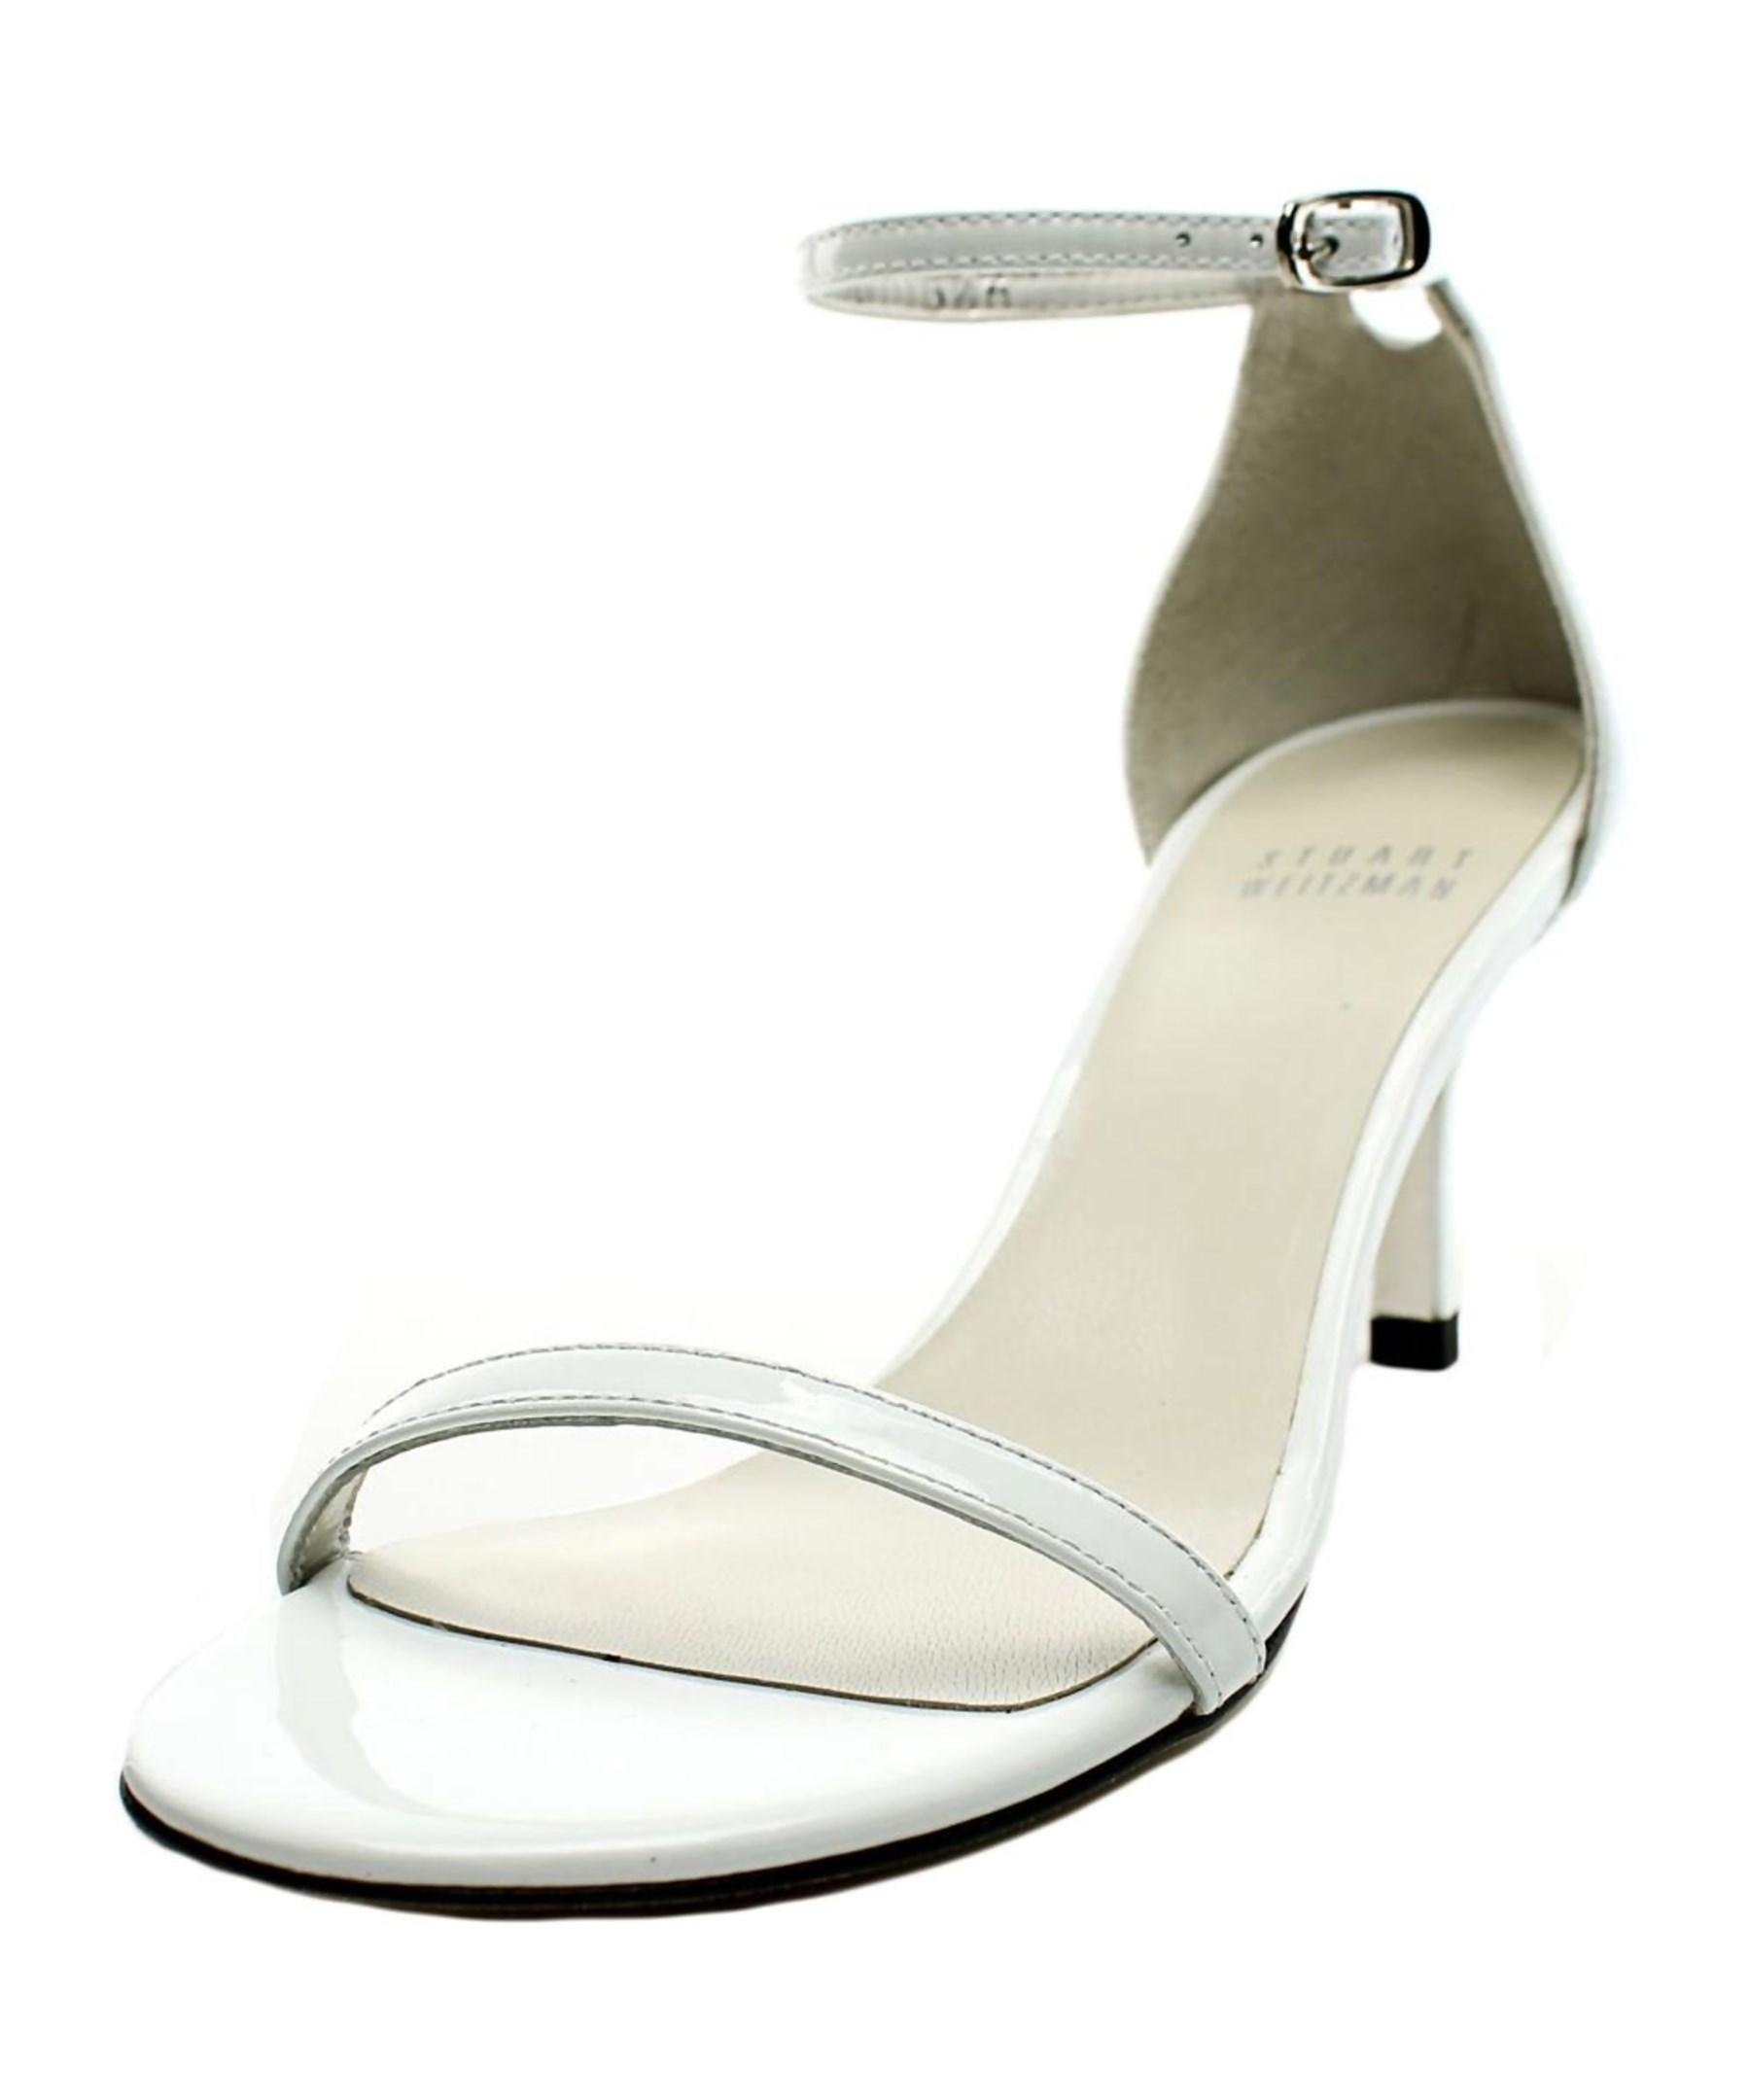 stuart weitzman open toe patent leather sandals in